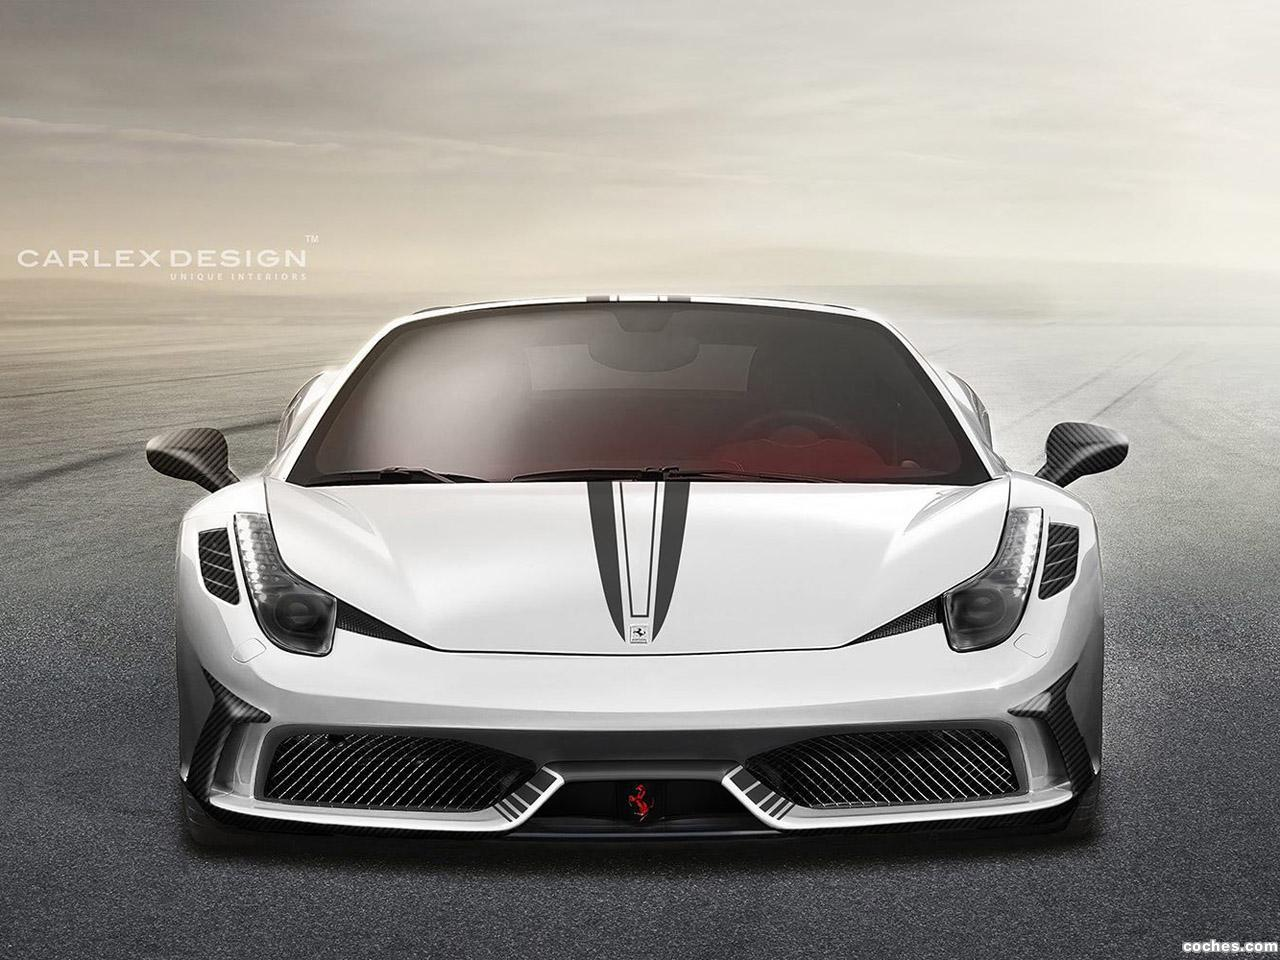 Foto 0 de Ferrari 458 Spider Concept by Carlex Design 2015